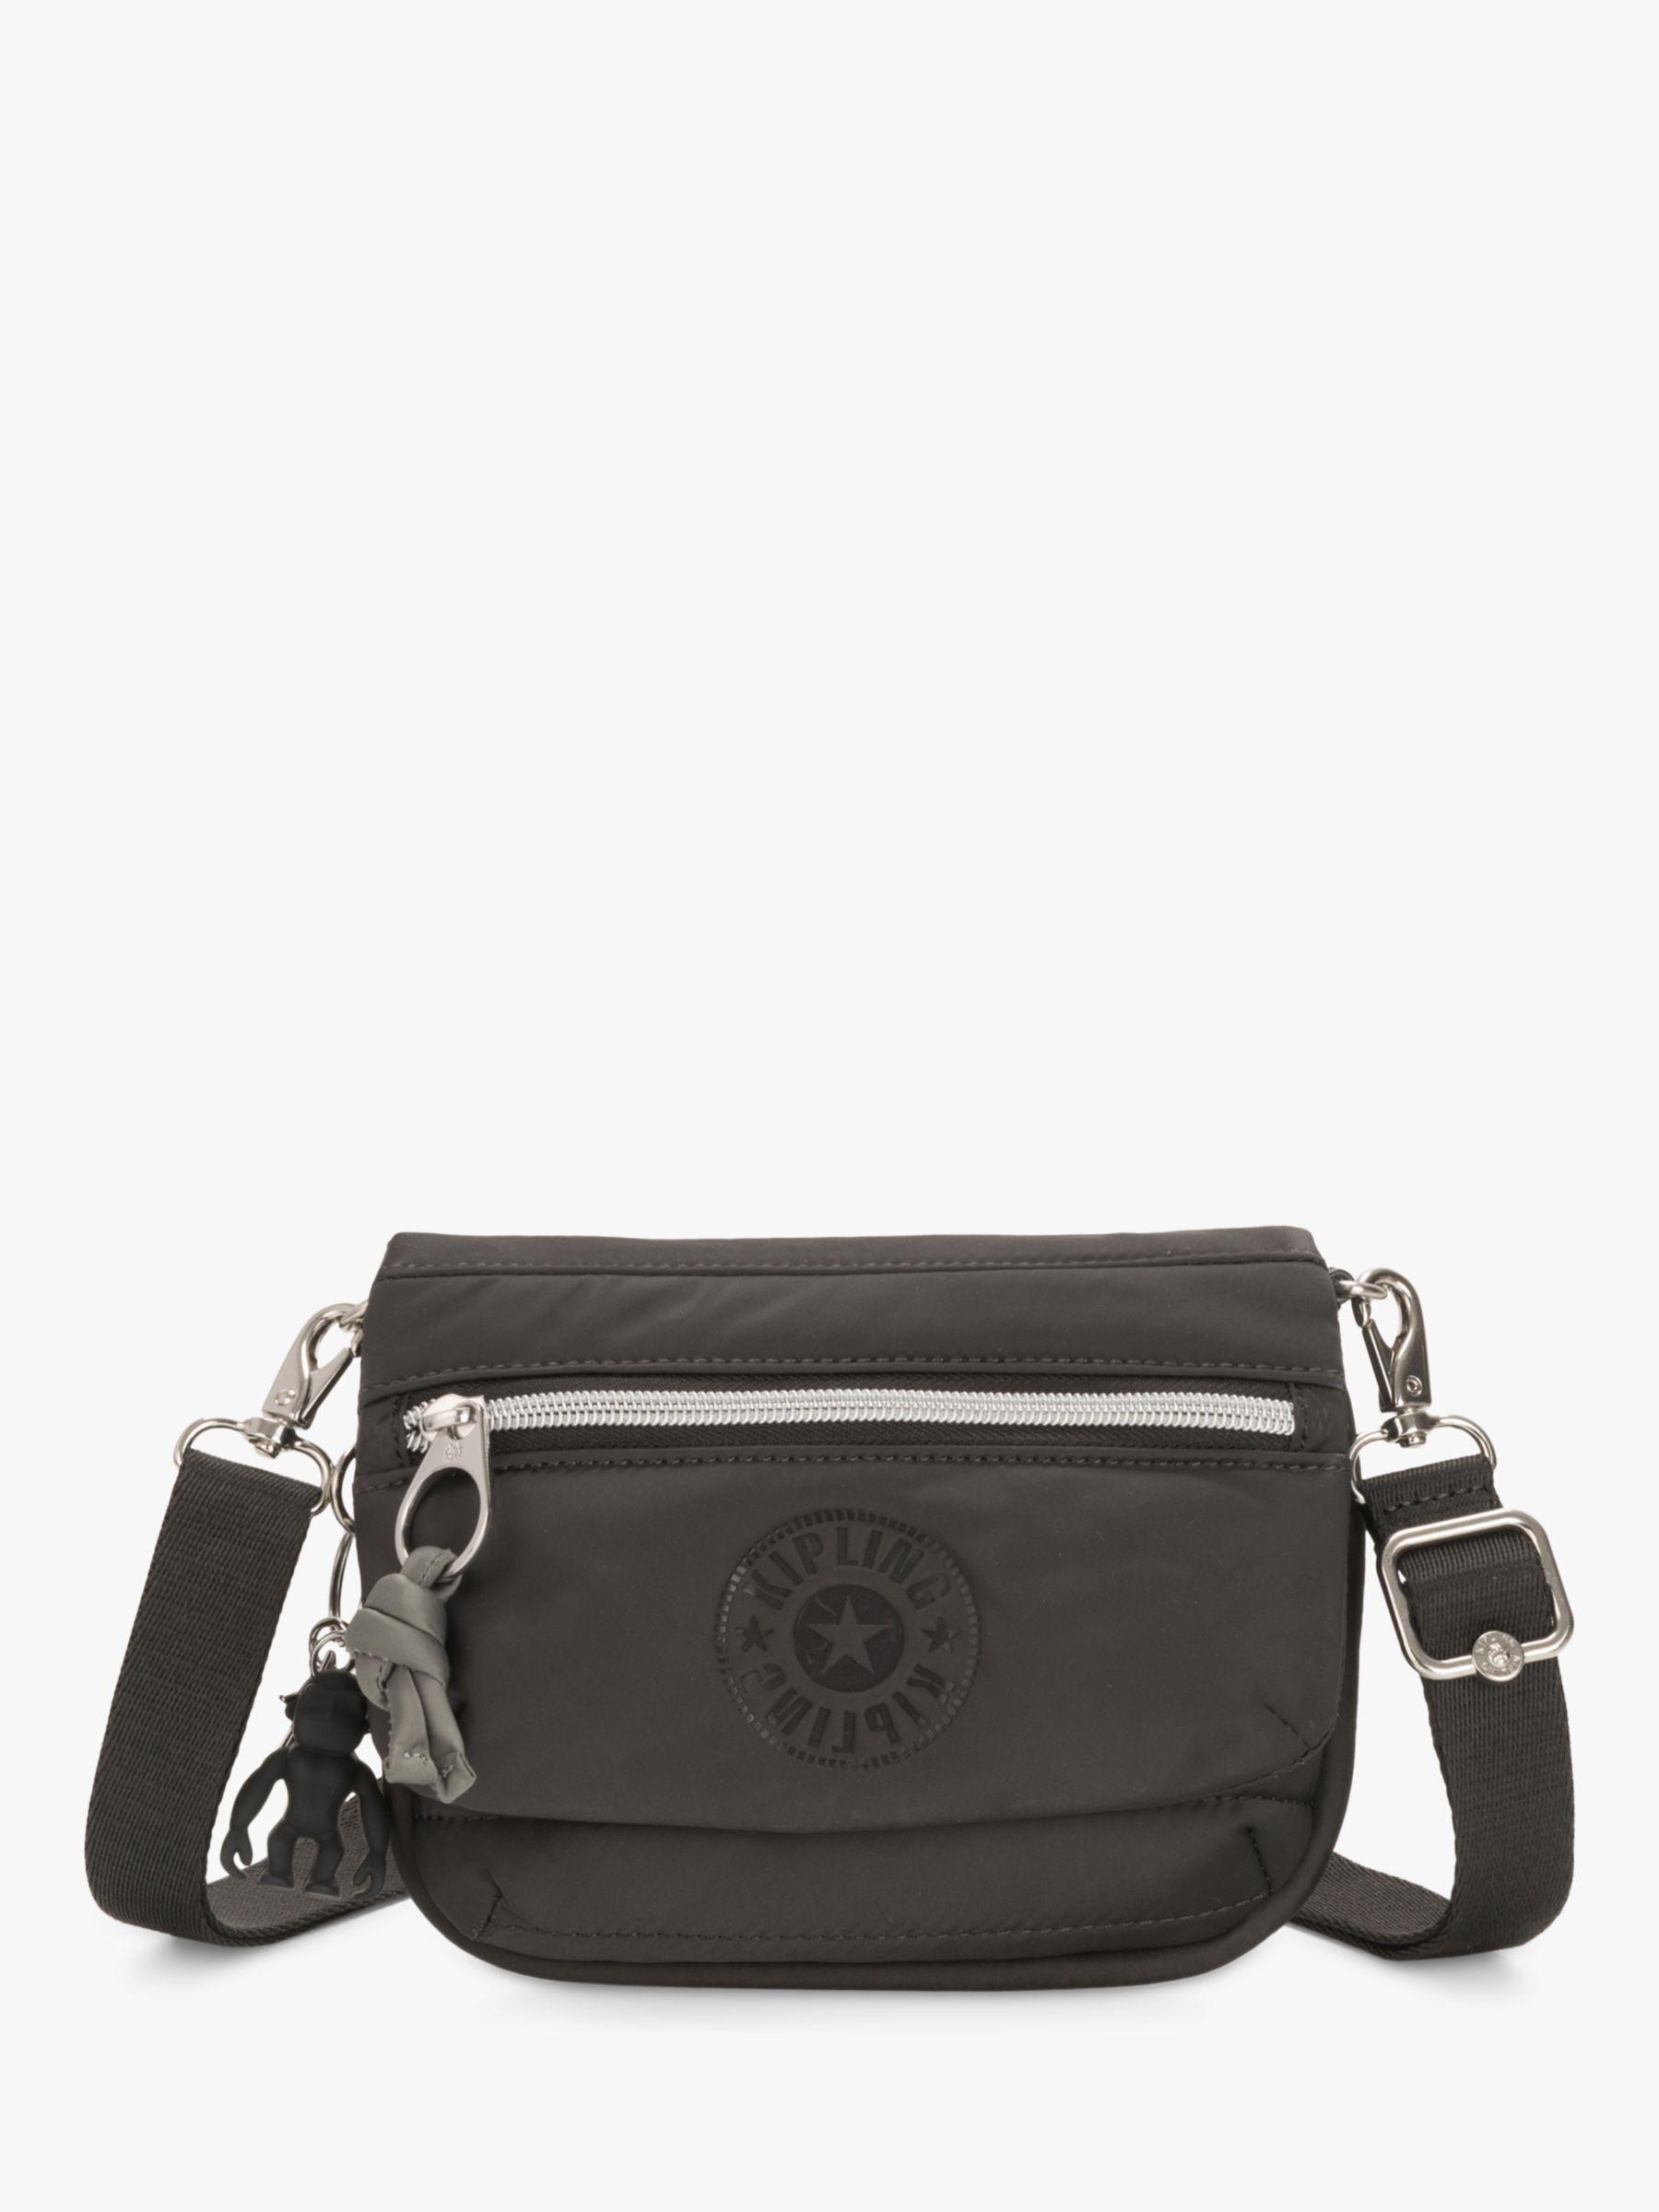 Kipling Kipling Tulia Small Convertible Cross Body Bag, Black